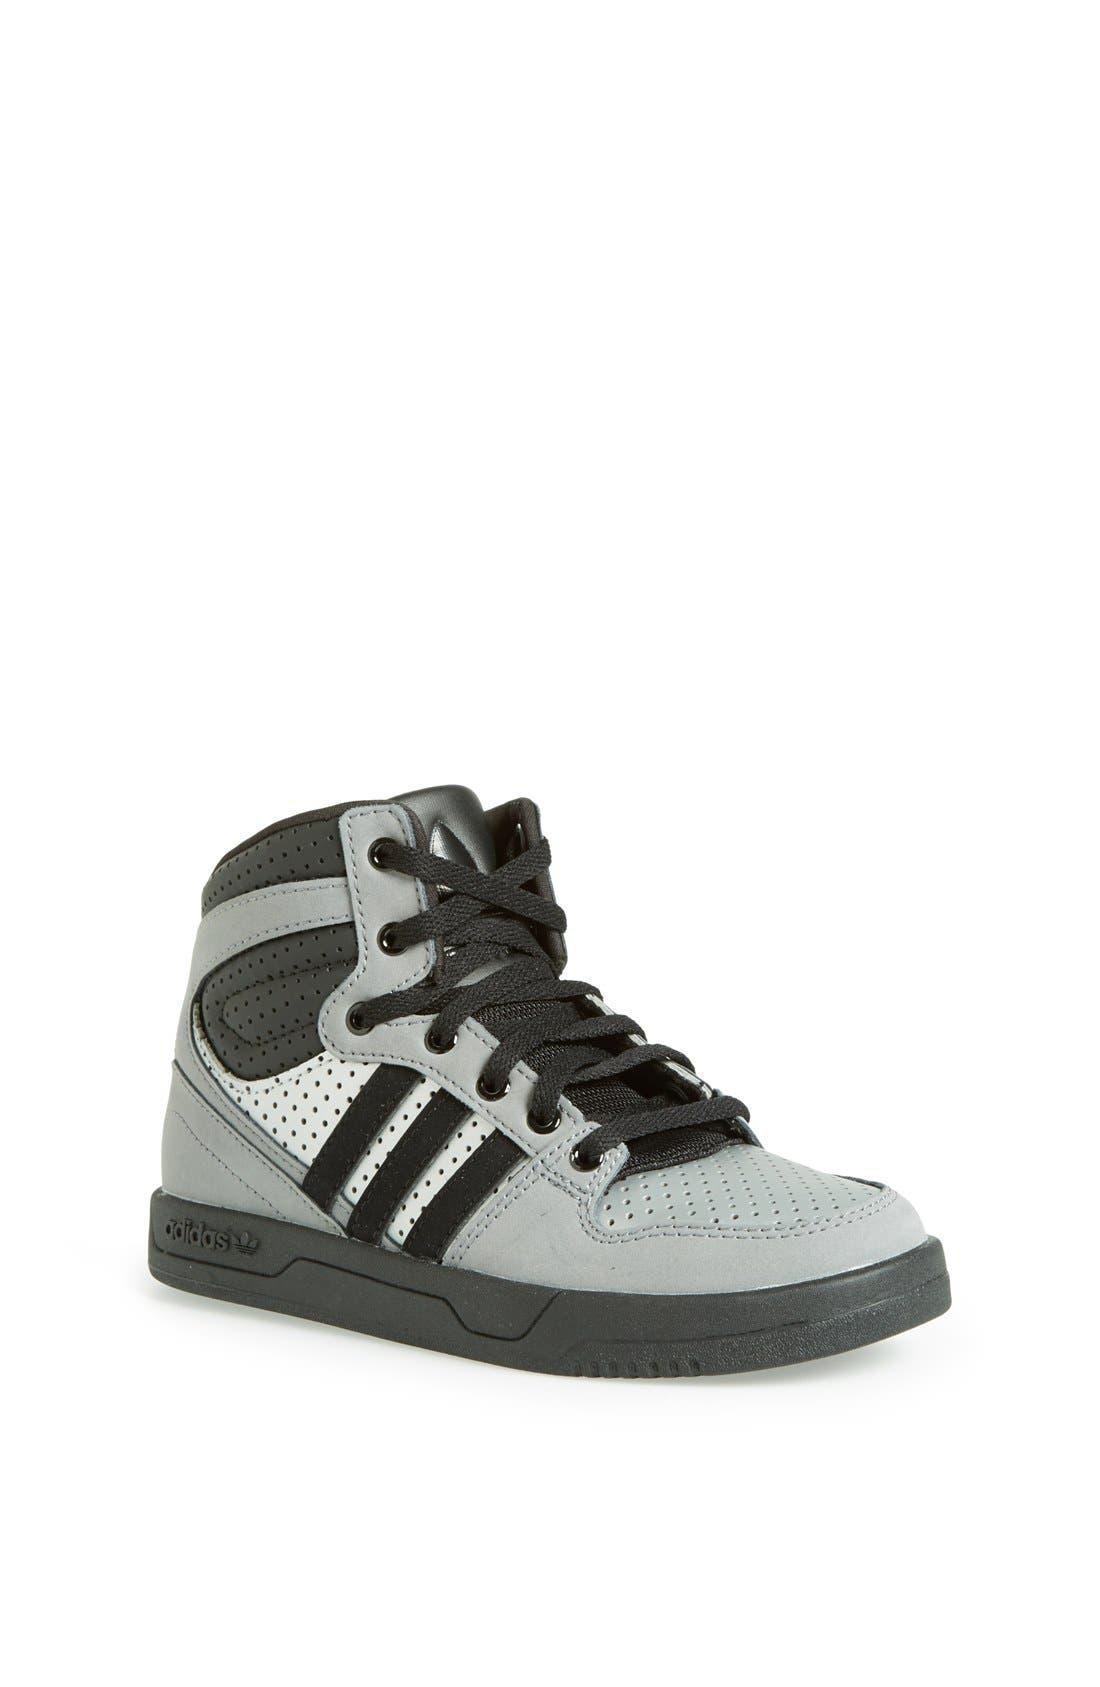 Alternate Image 1 Selected - adidas 'Court Attitude' Sneaker (Toddler, Little Kid & Big Kid)